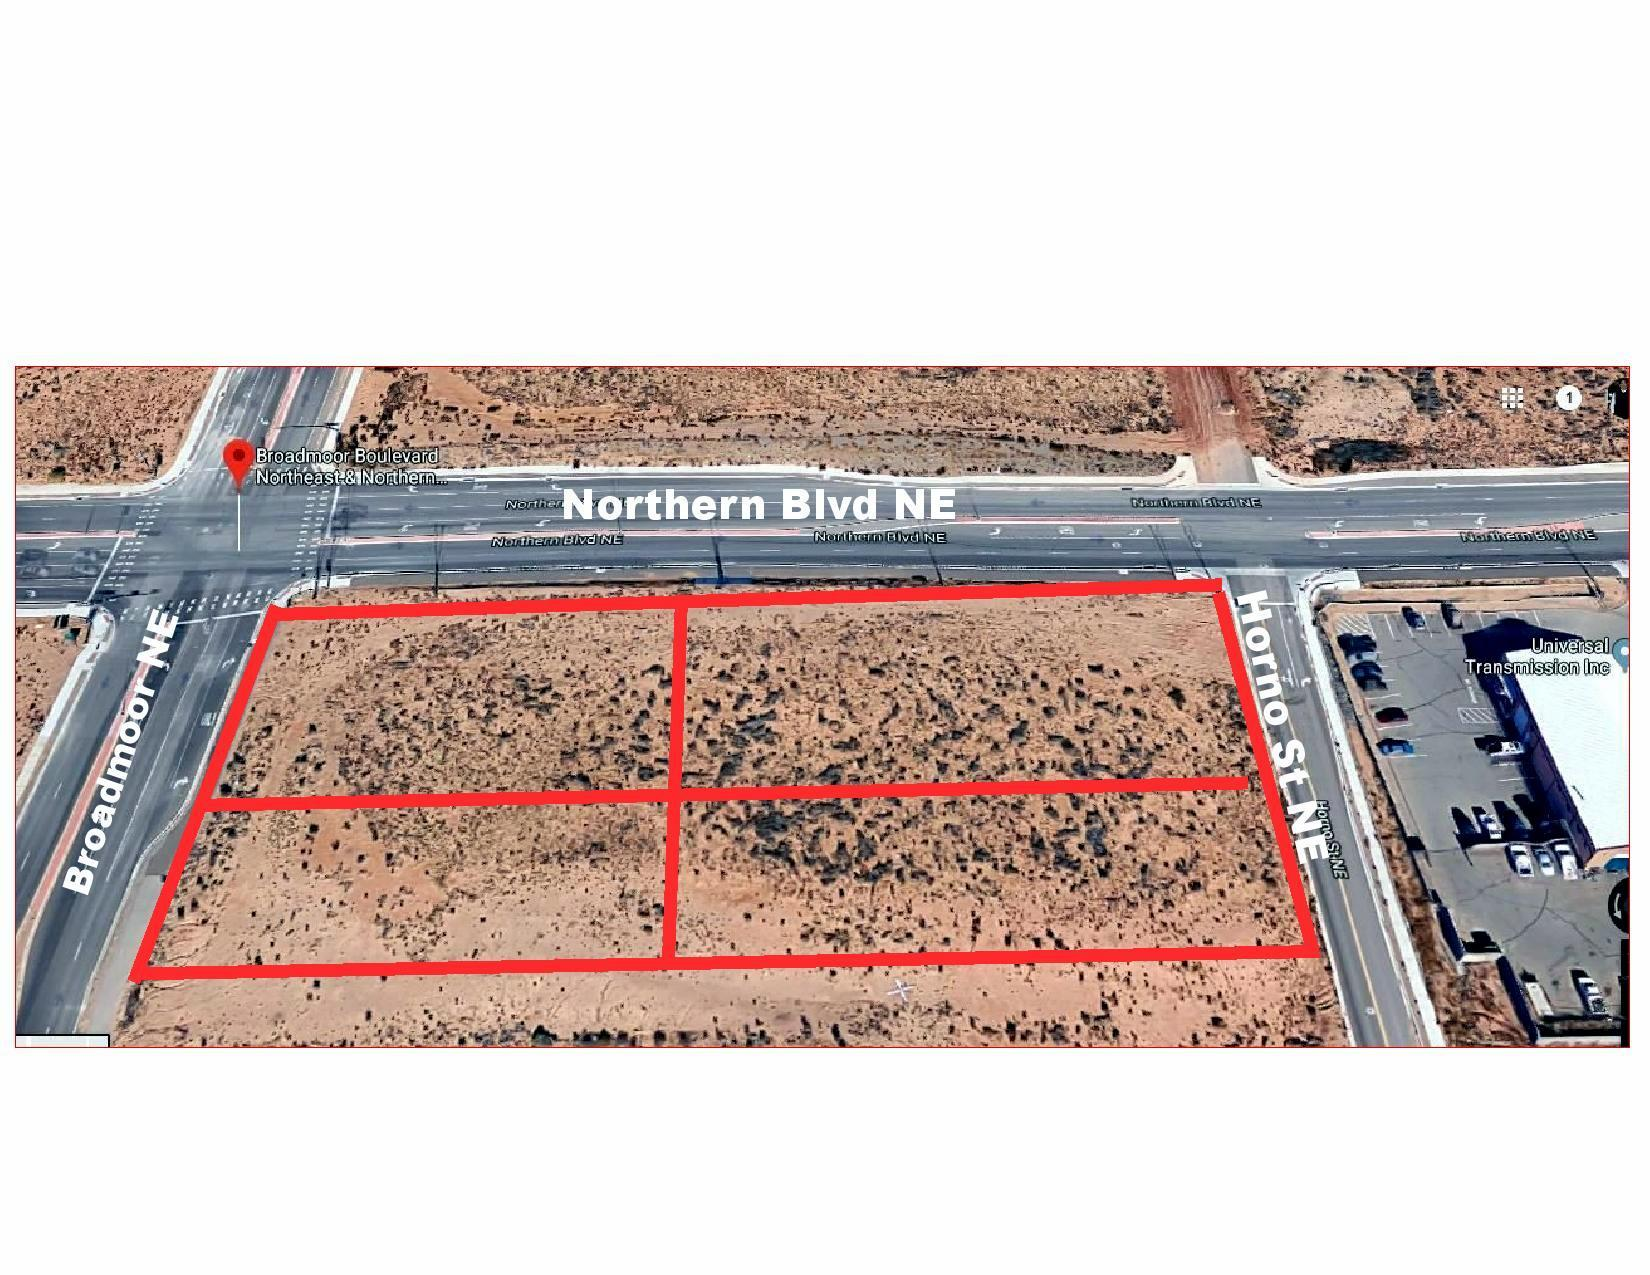 Broadmoor and Northern Blvd NE, Rio Rancho, NM 87124 - Rio Rancho, NM real estate listing